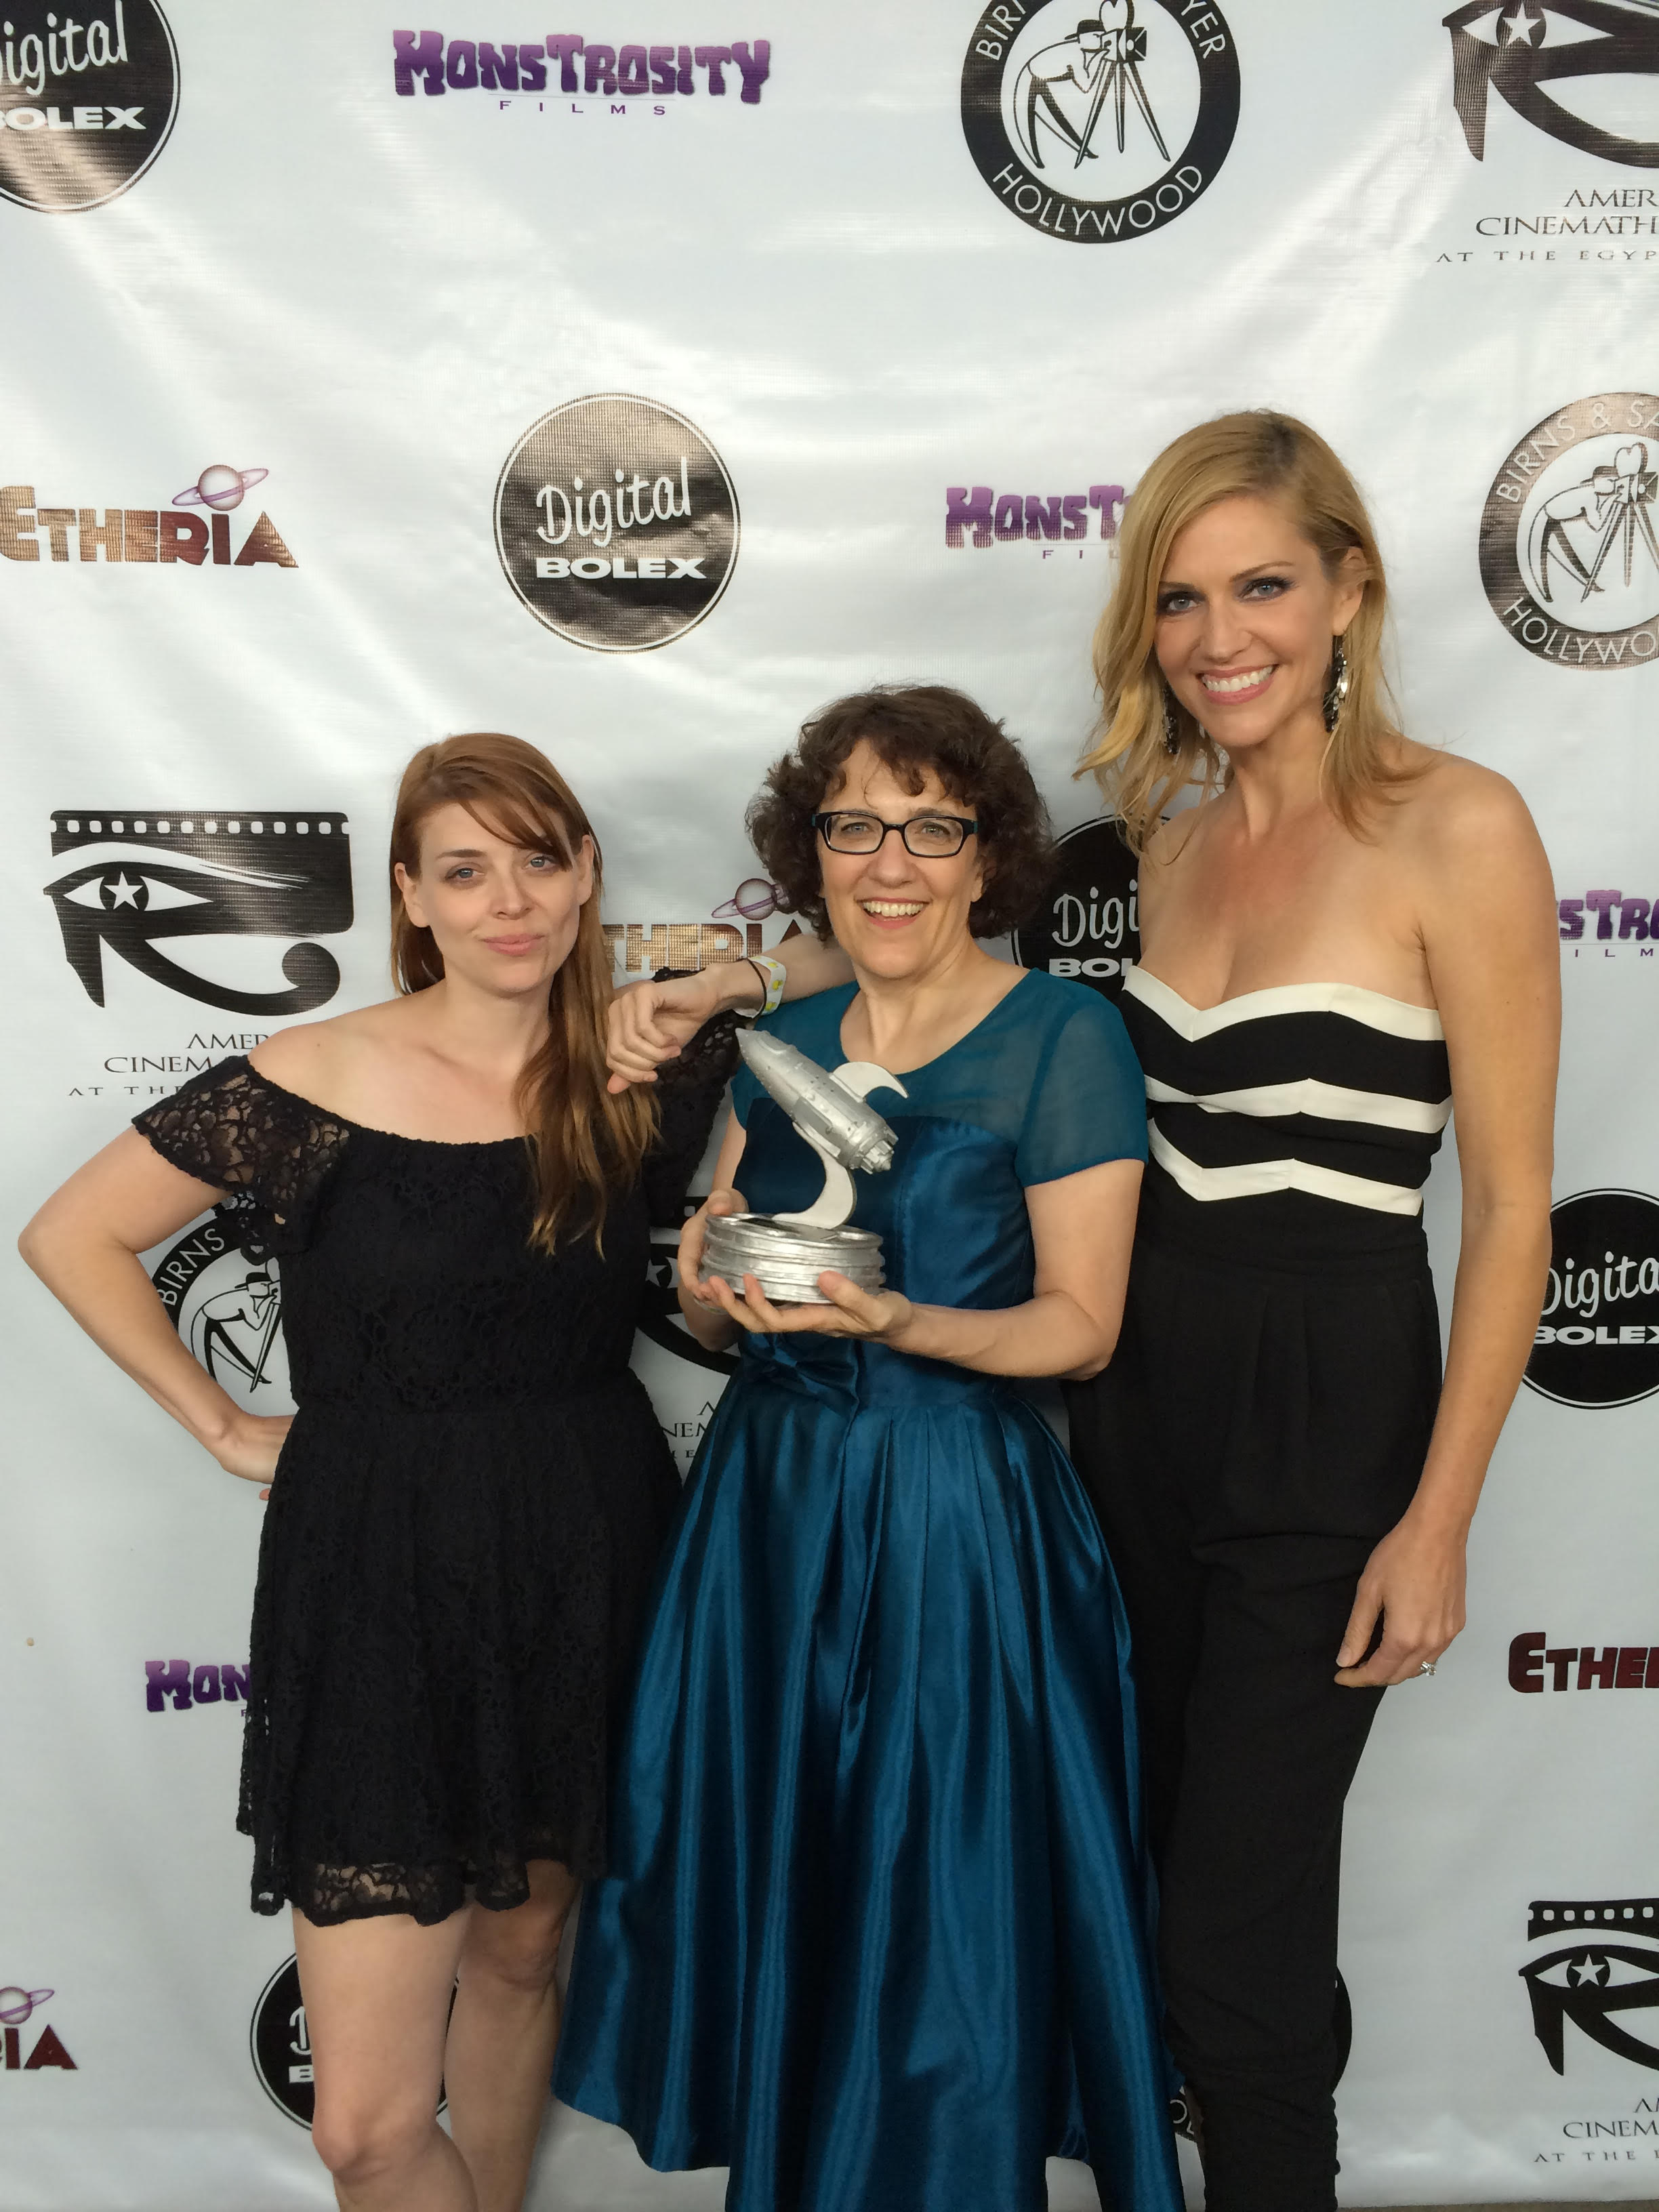 Jane Espenson, Tricia Helfer, and Amber Benson at Etheria Film Night 2015